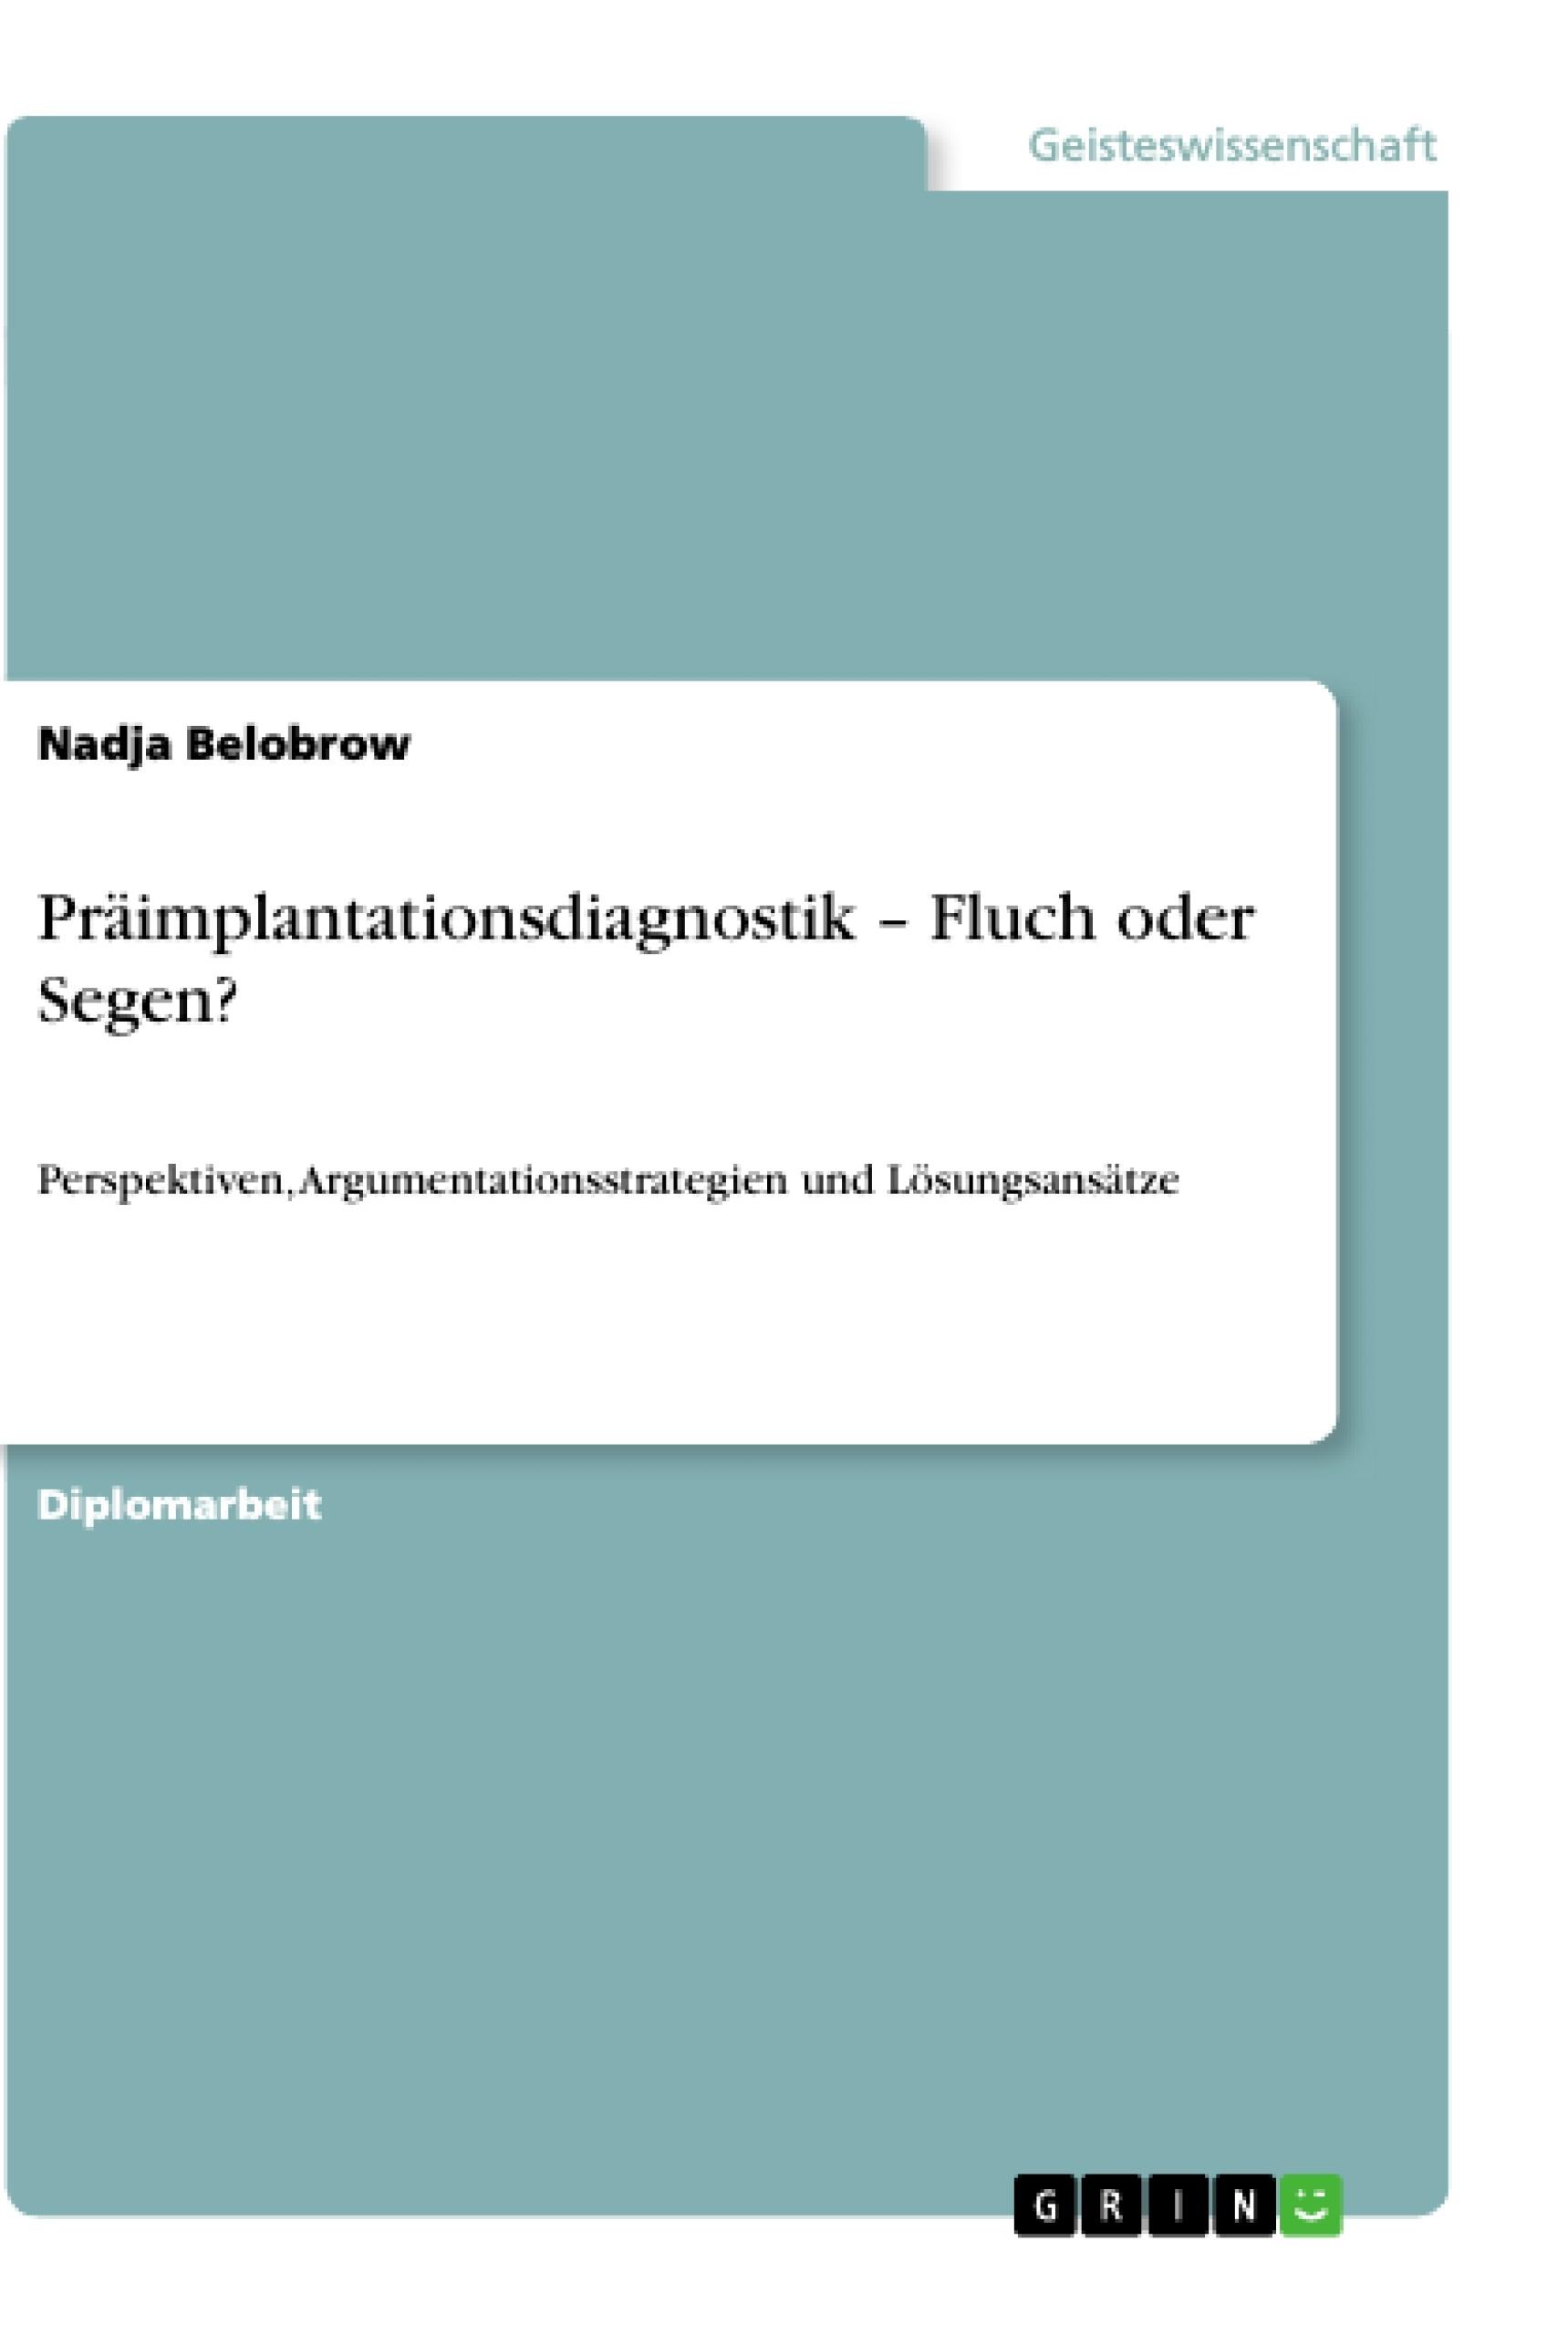 Titel: Präimplantationsdiagnostik – Fluch oder Segen?